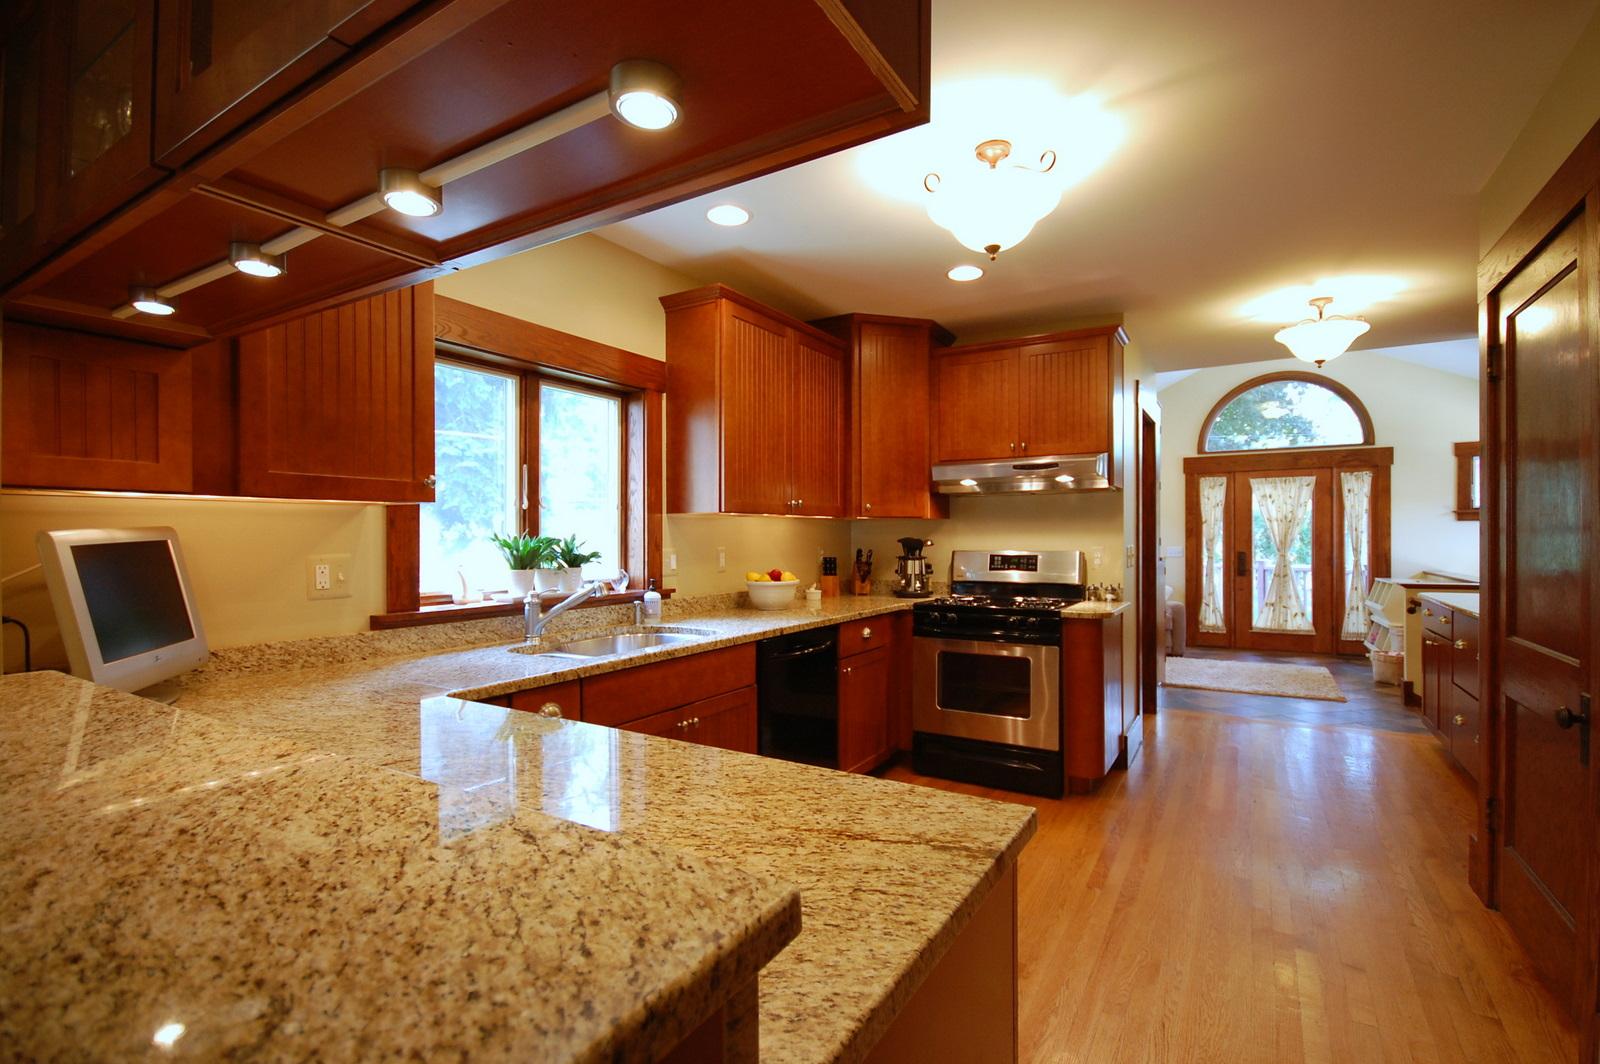 maecenas eget diam nec mi dignissim pharetra granite kitchen table antique white kitchen cabinets with granite countertops design granite kitchen countertops kitchen design ideas granite